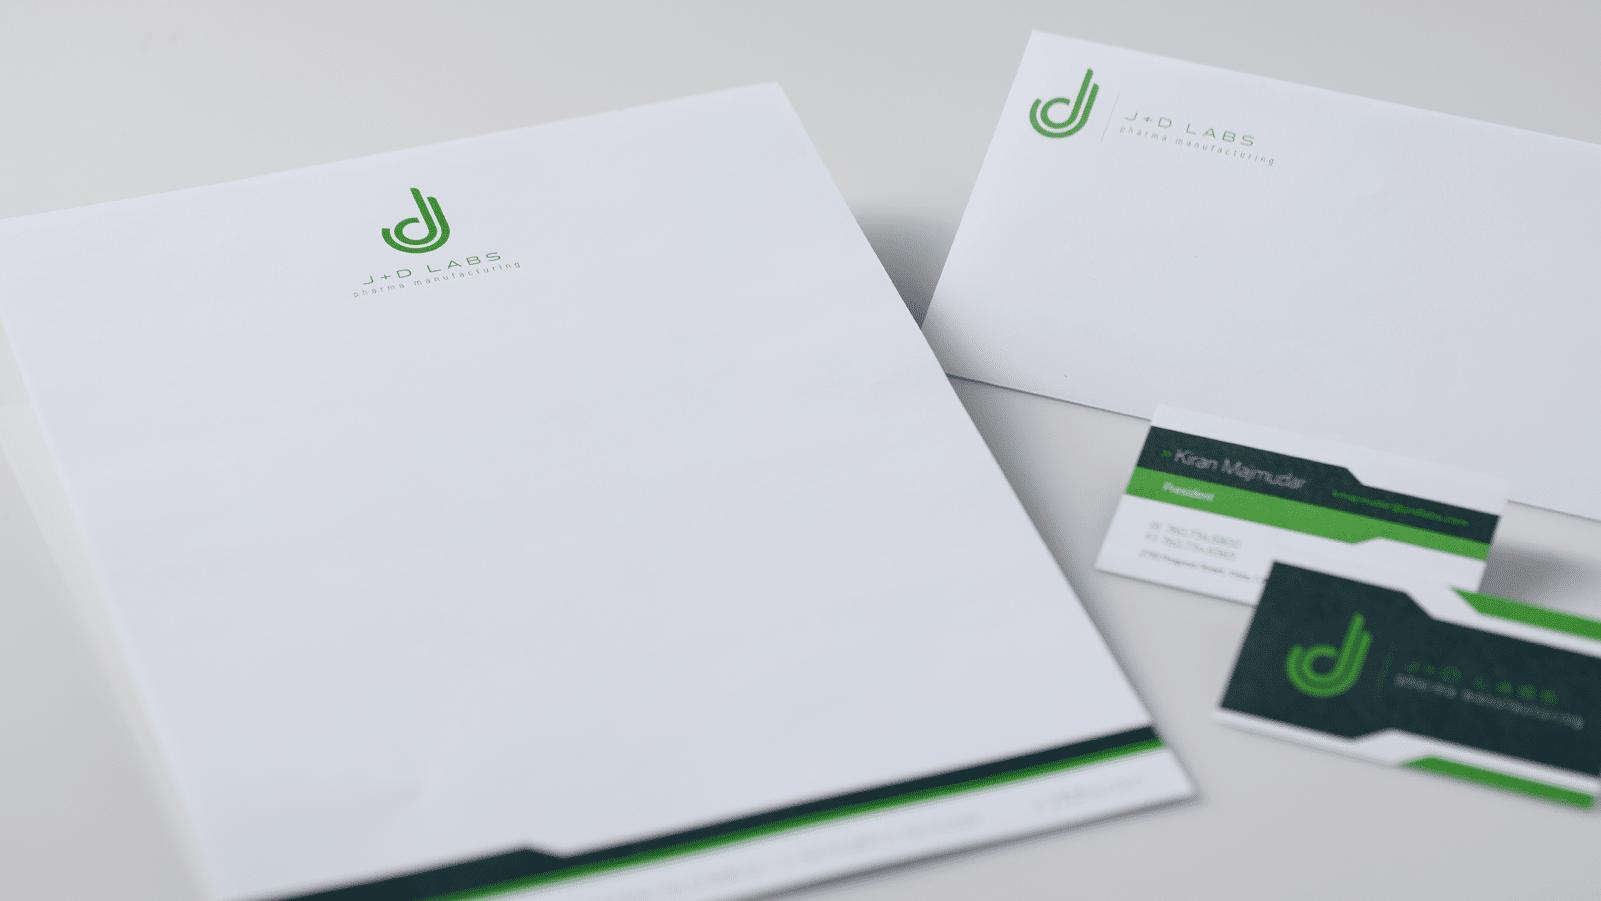 j+d labs branding materials